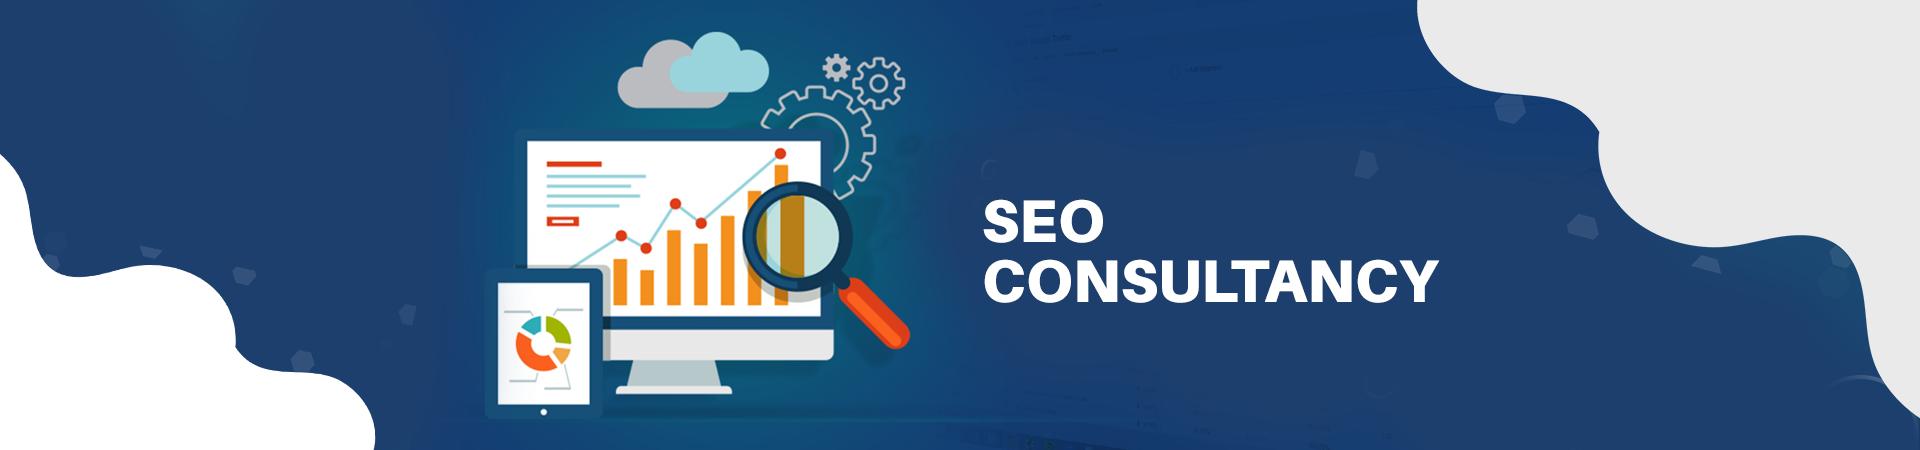 SEO Consultant Services